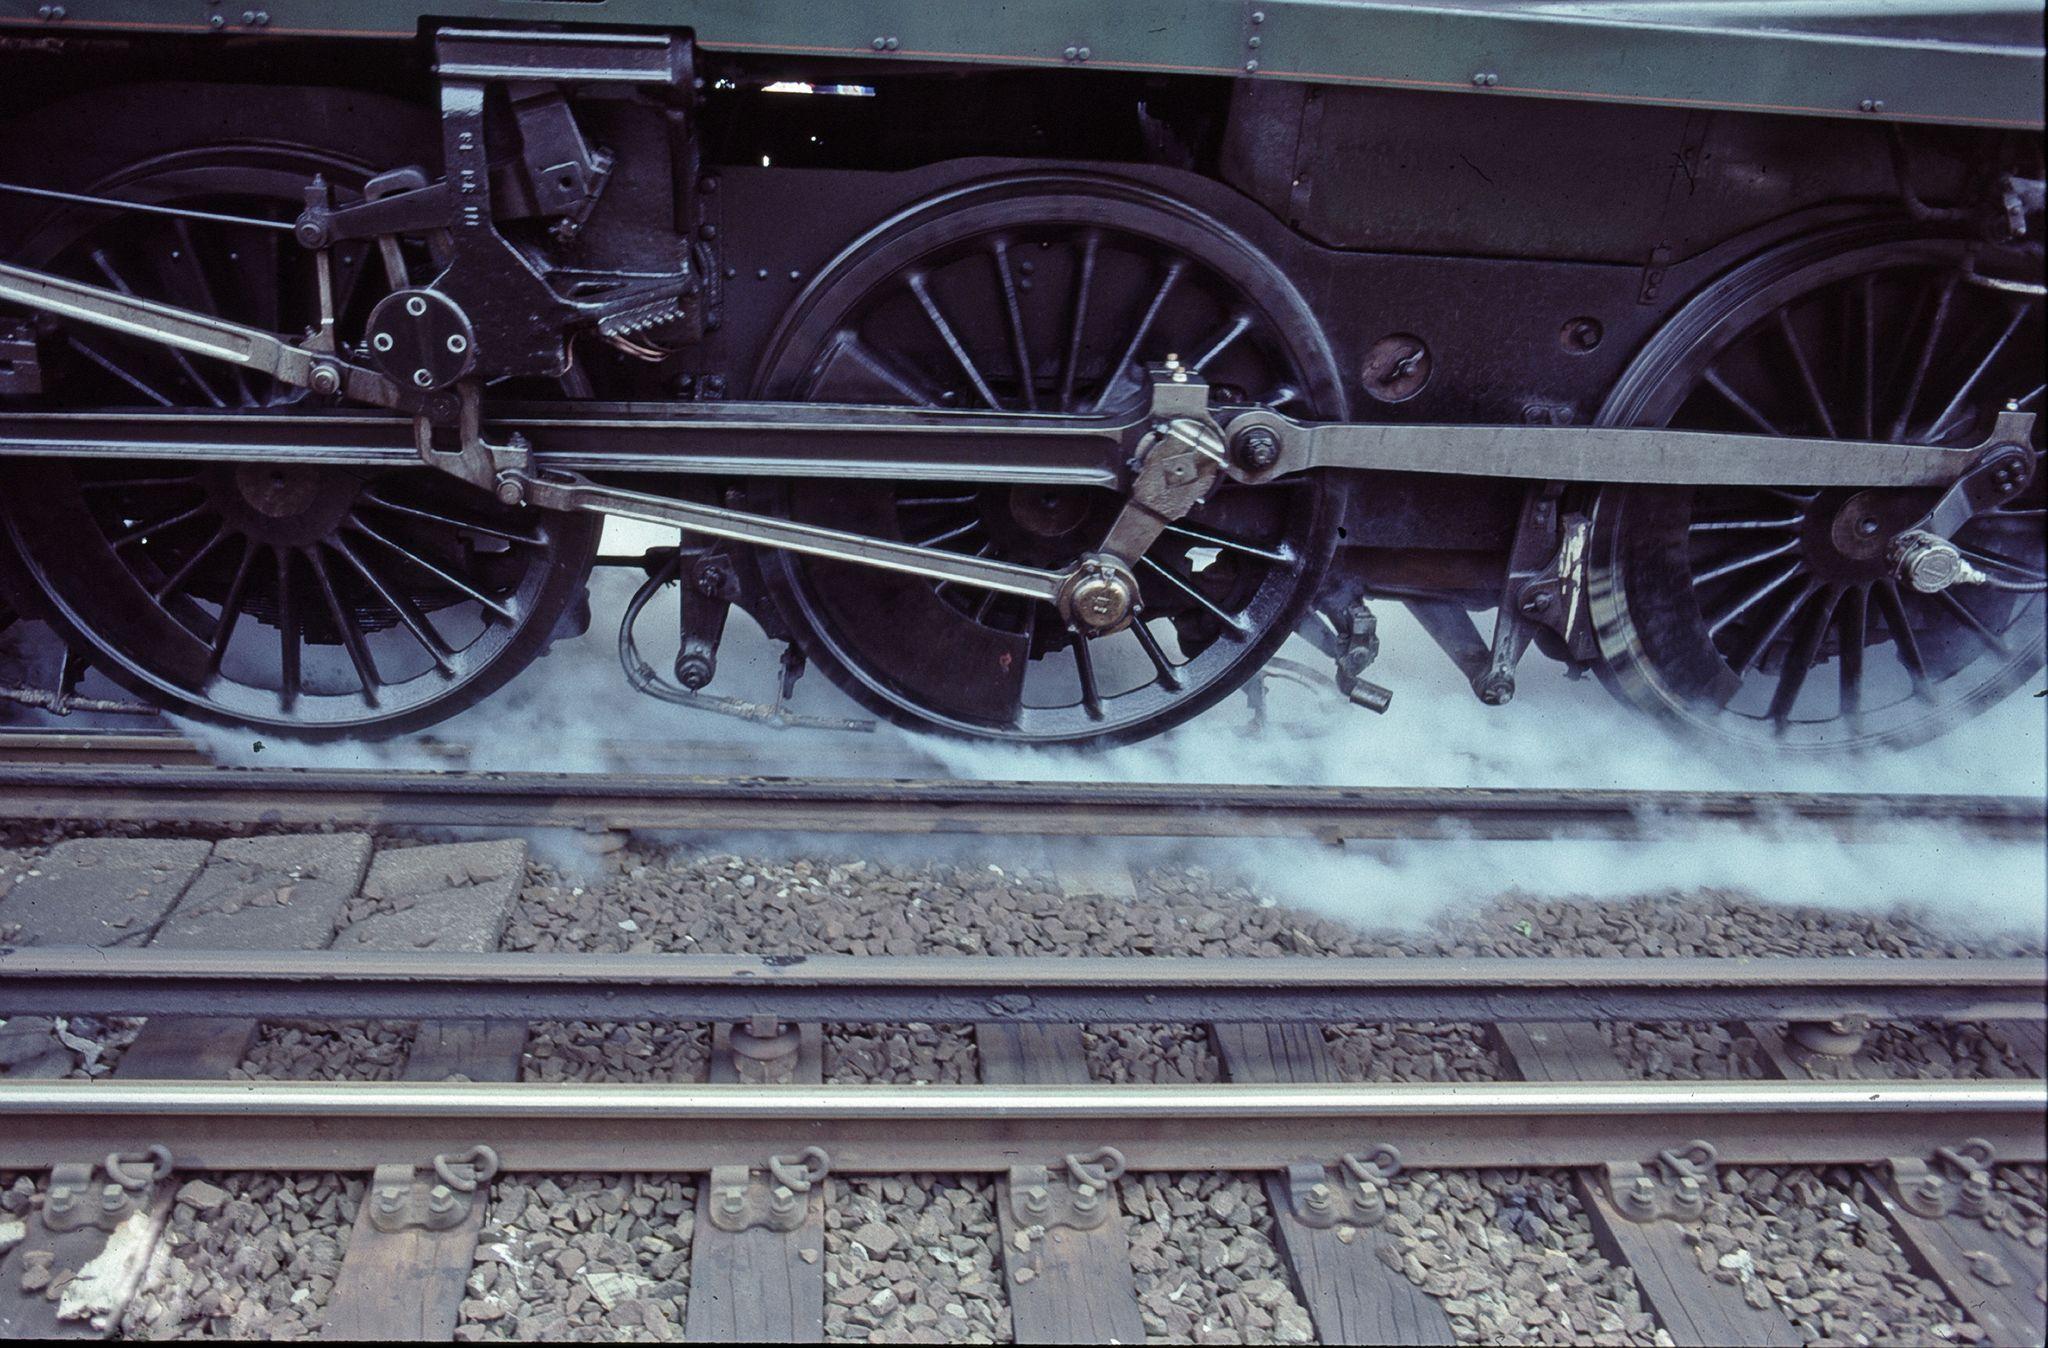 Erewash Borough Council – Steam returns to Ilkeston